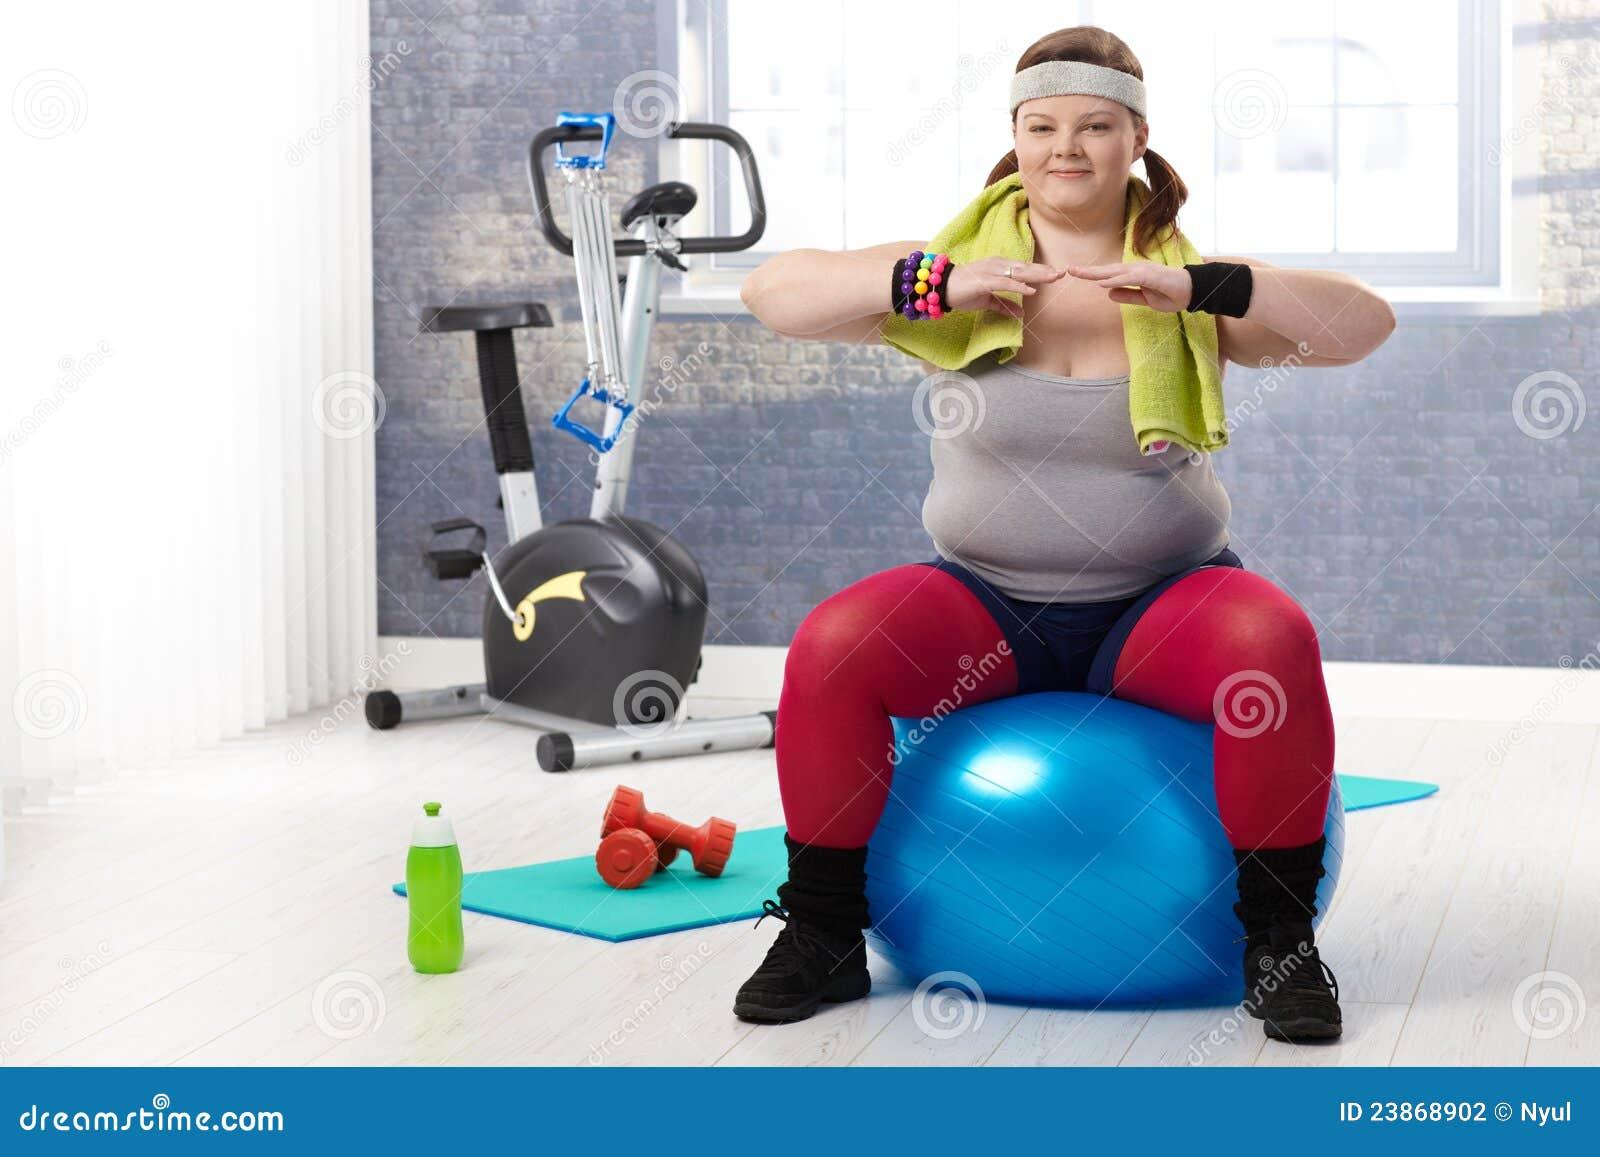 gymnastics Fat girl doing